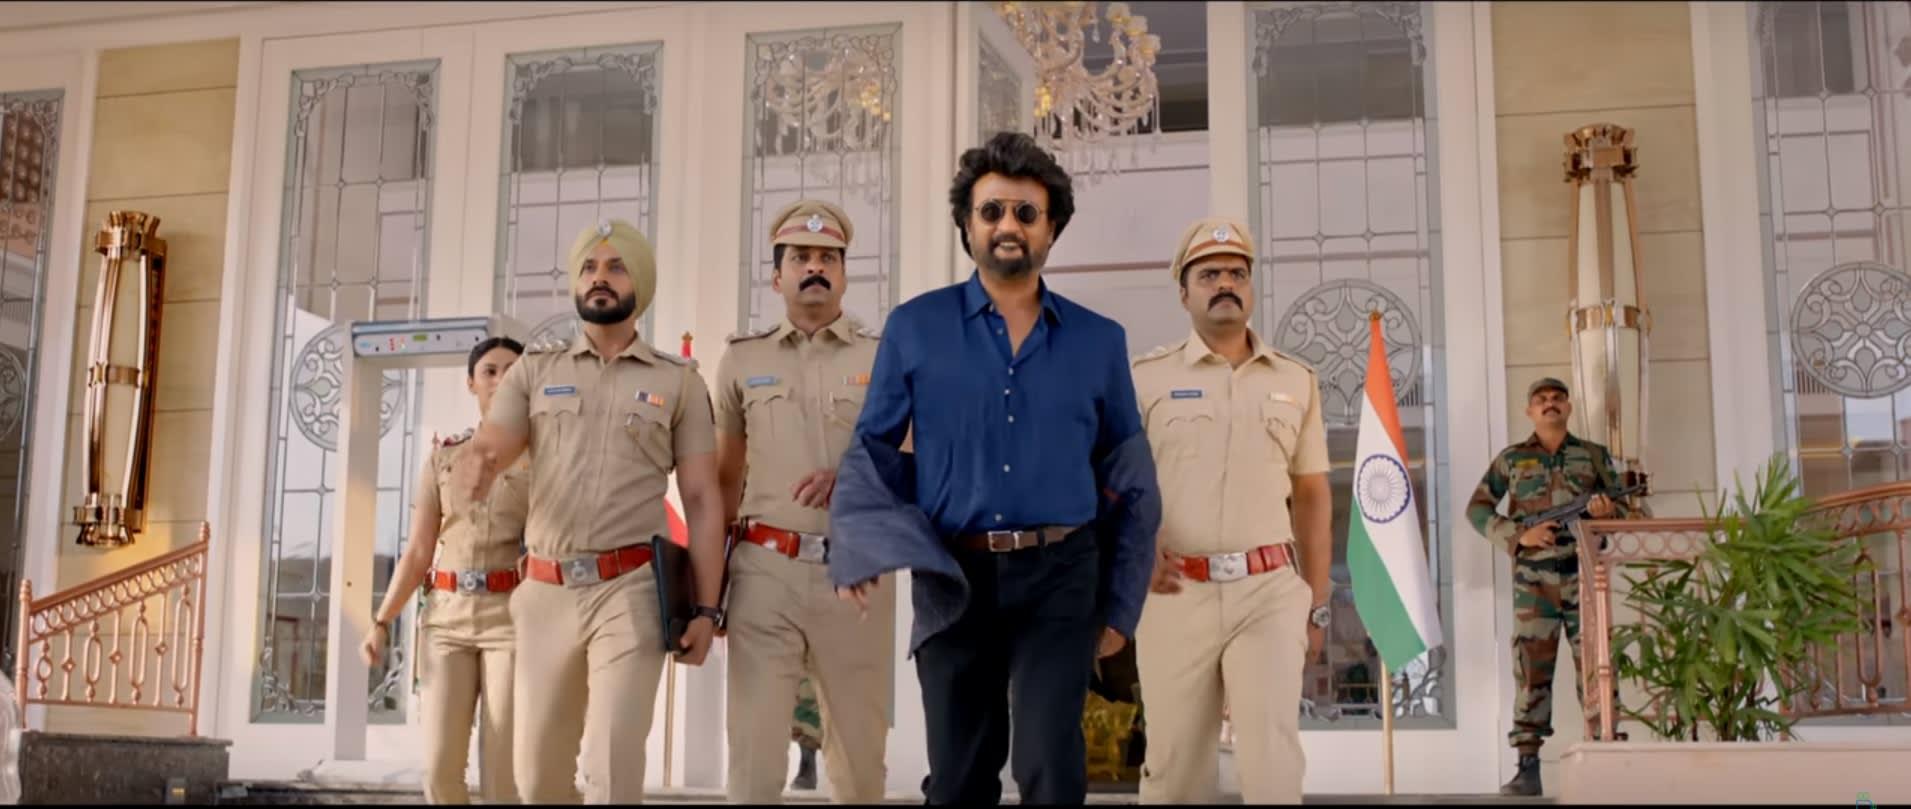 Darbar Full Movie Download in 480p Tamilrockers Pagalworld Filmyzila